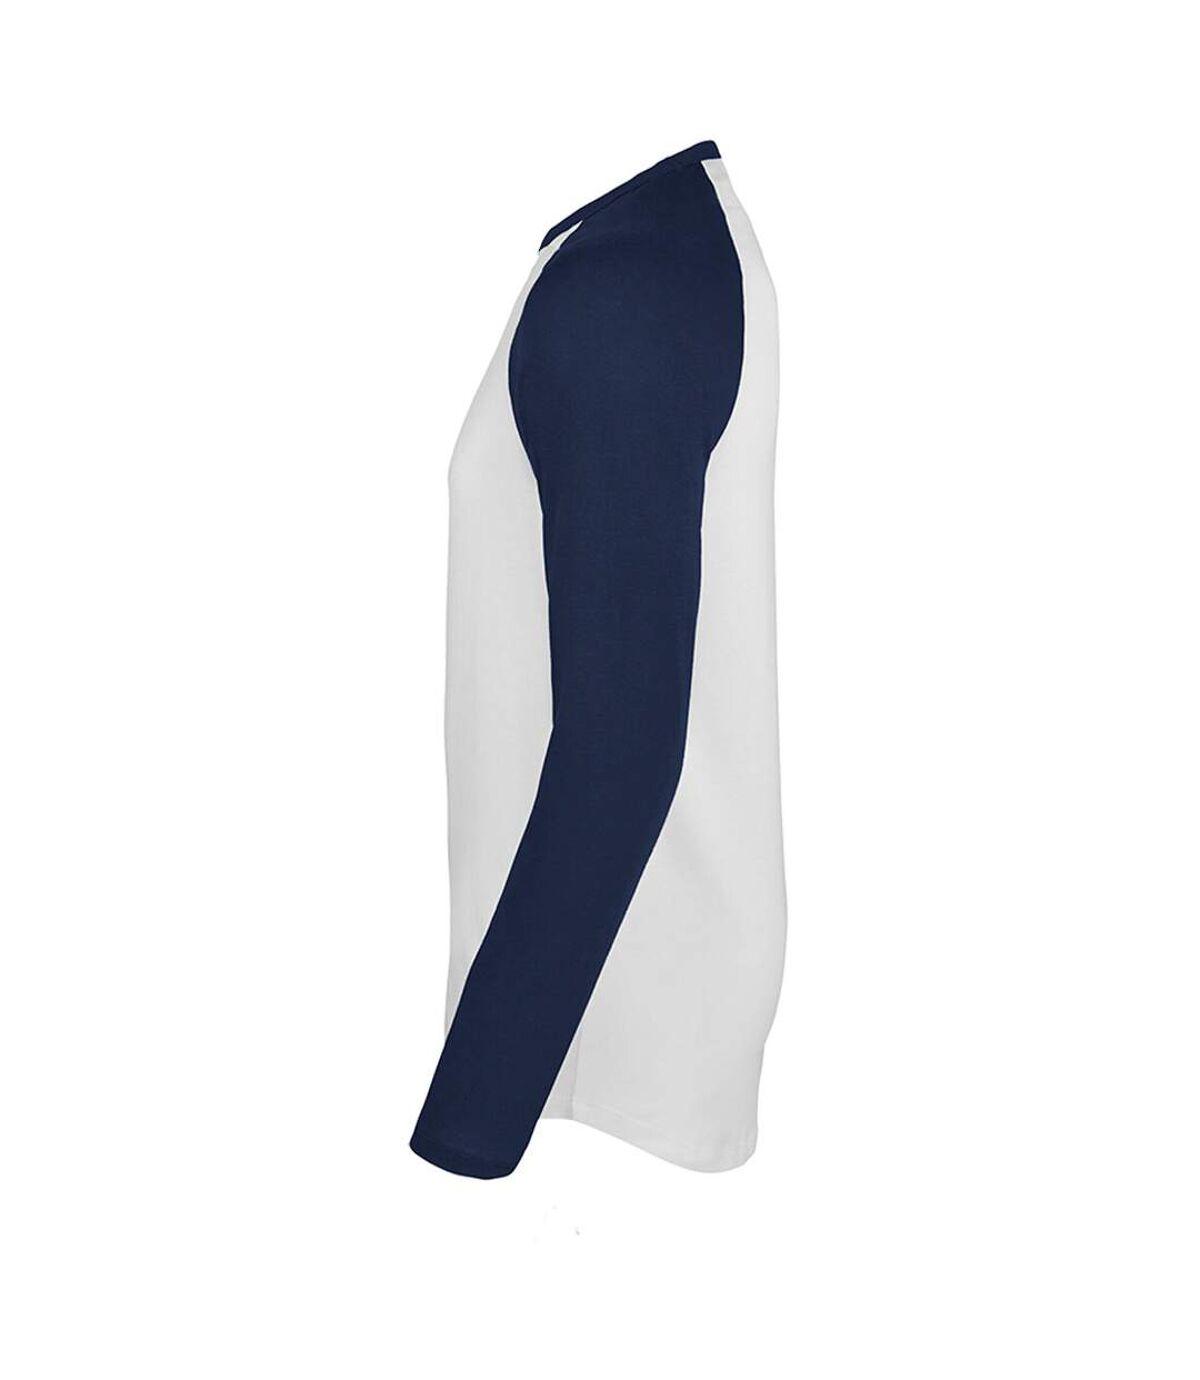 SOLS - T-shirt manches longues FUNKY - Homme (Blanc/bleu marine) - UTPC3513